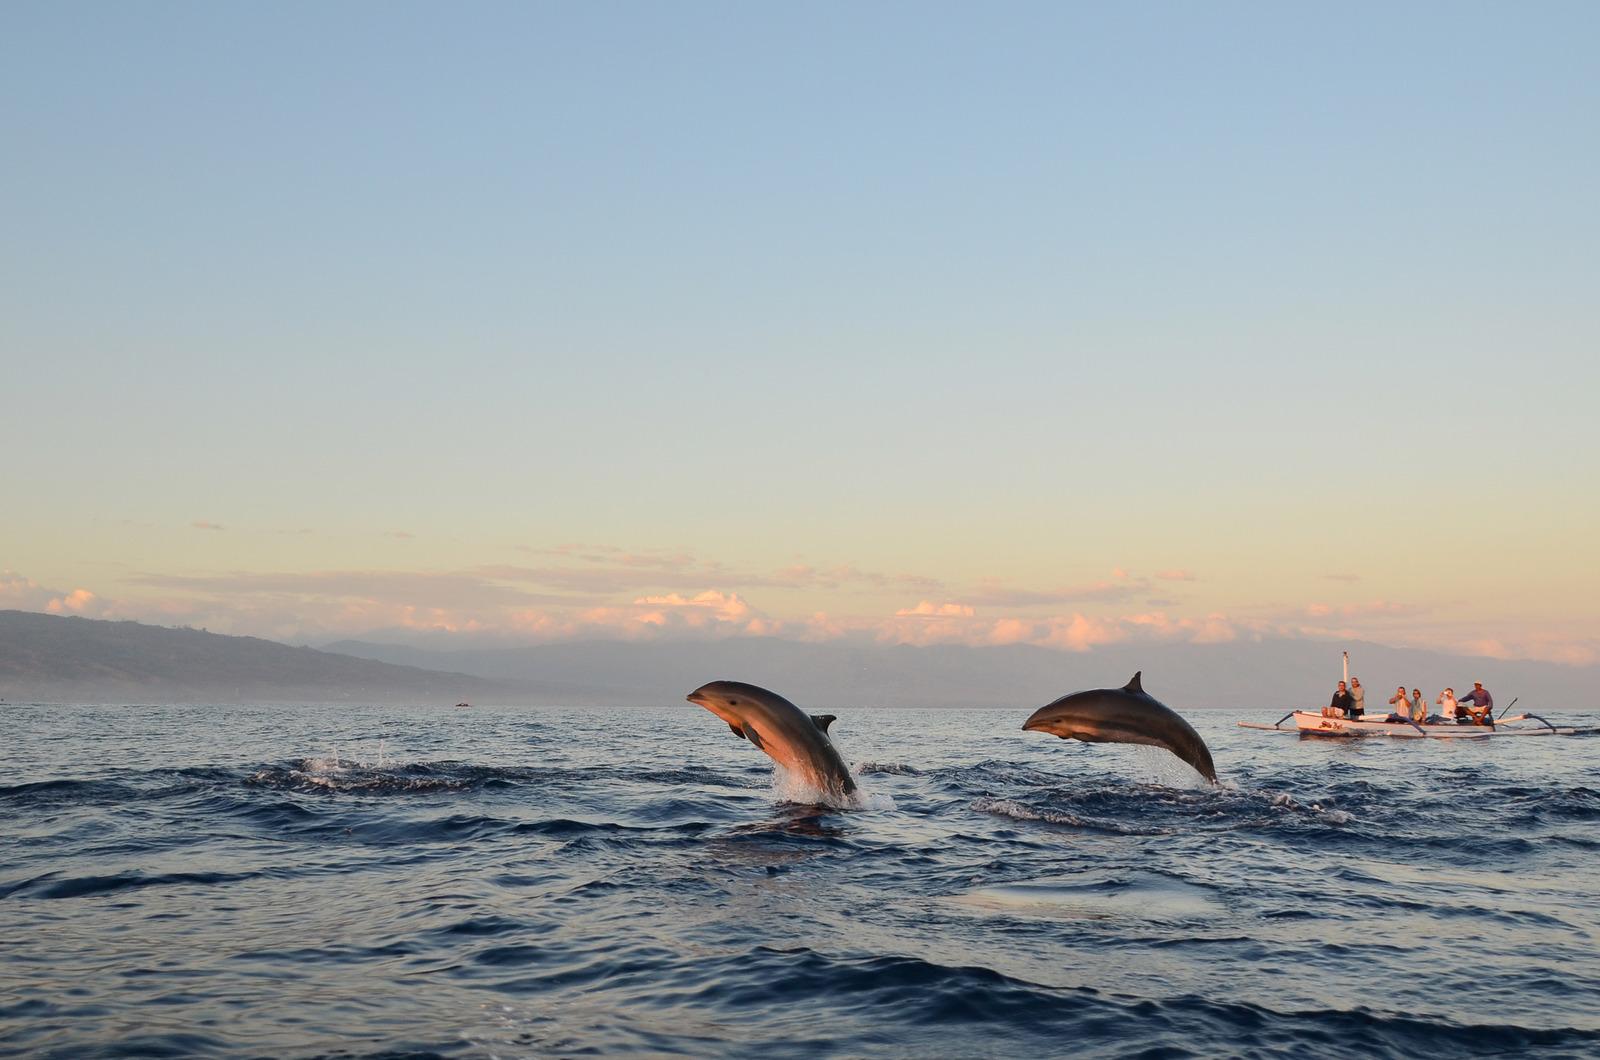 https://www.dolphinesse.com/p/escapade-bien-etre-dauphins-sauvages.html